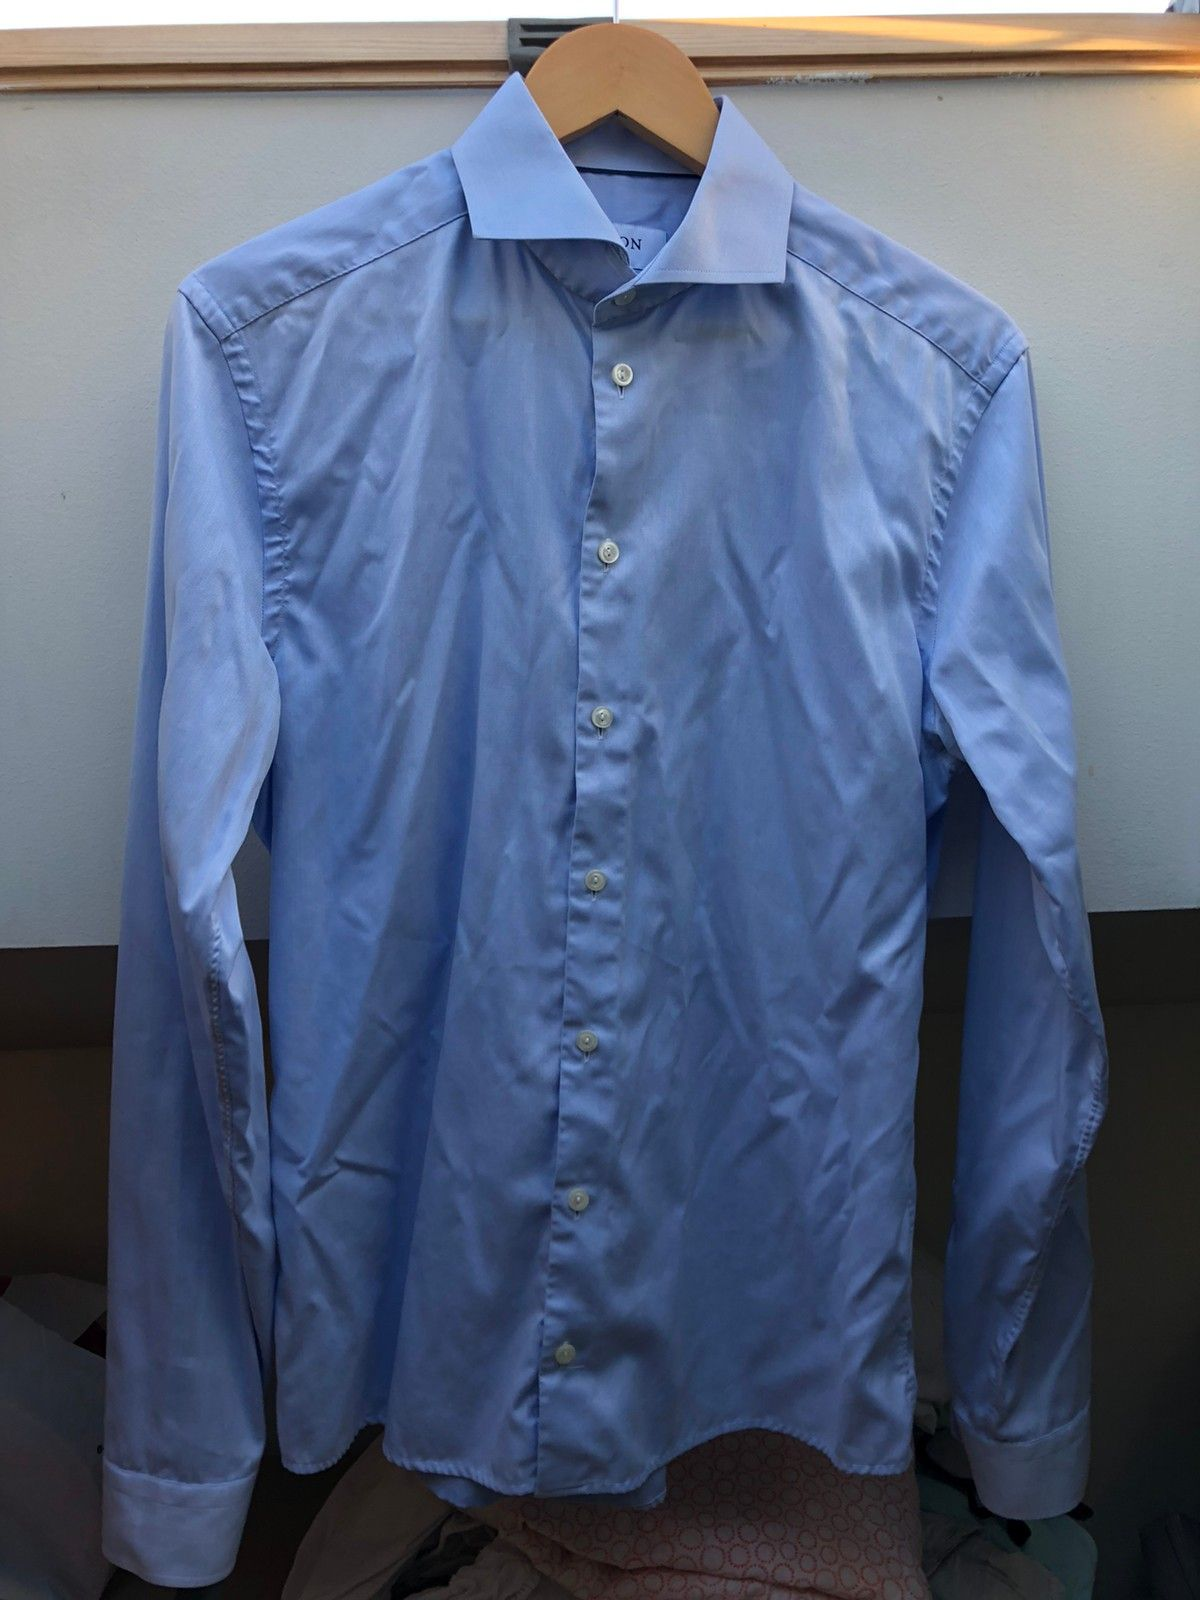 Eton skjorte 38 | FINN.no